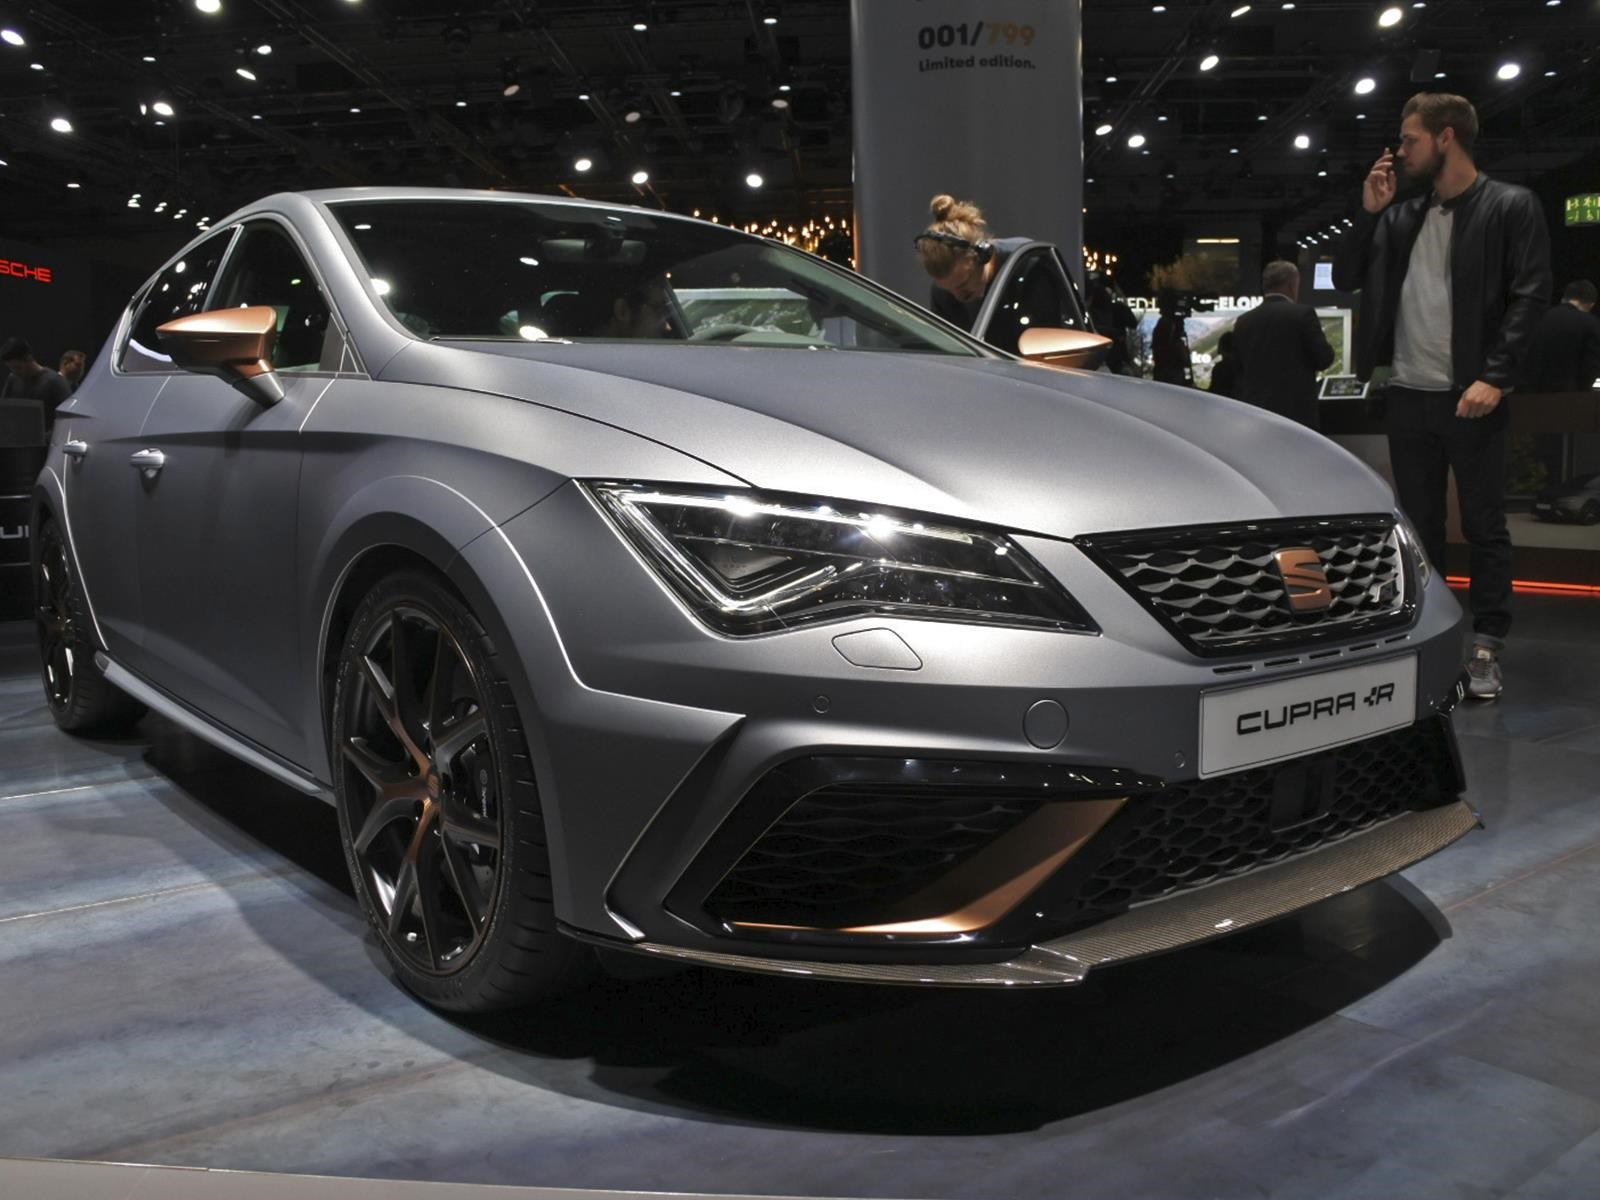 SEAT León Cupra R se presenta